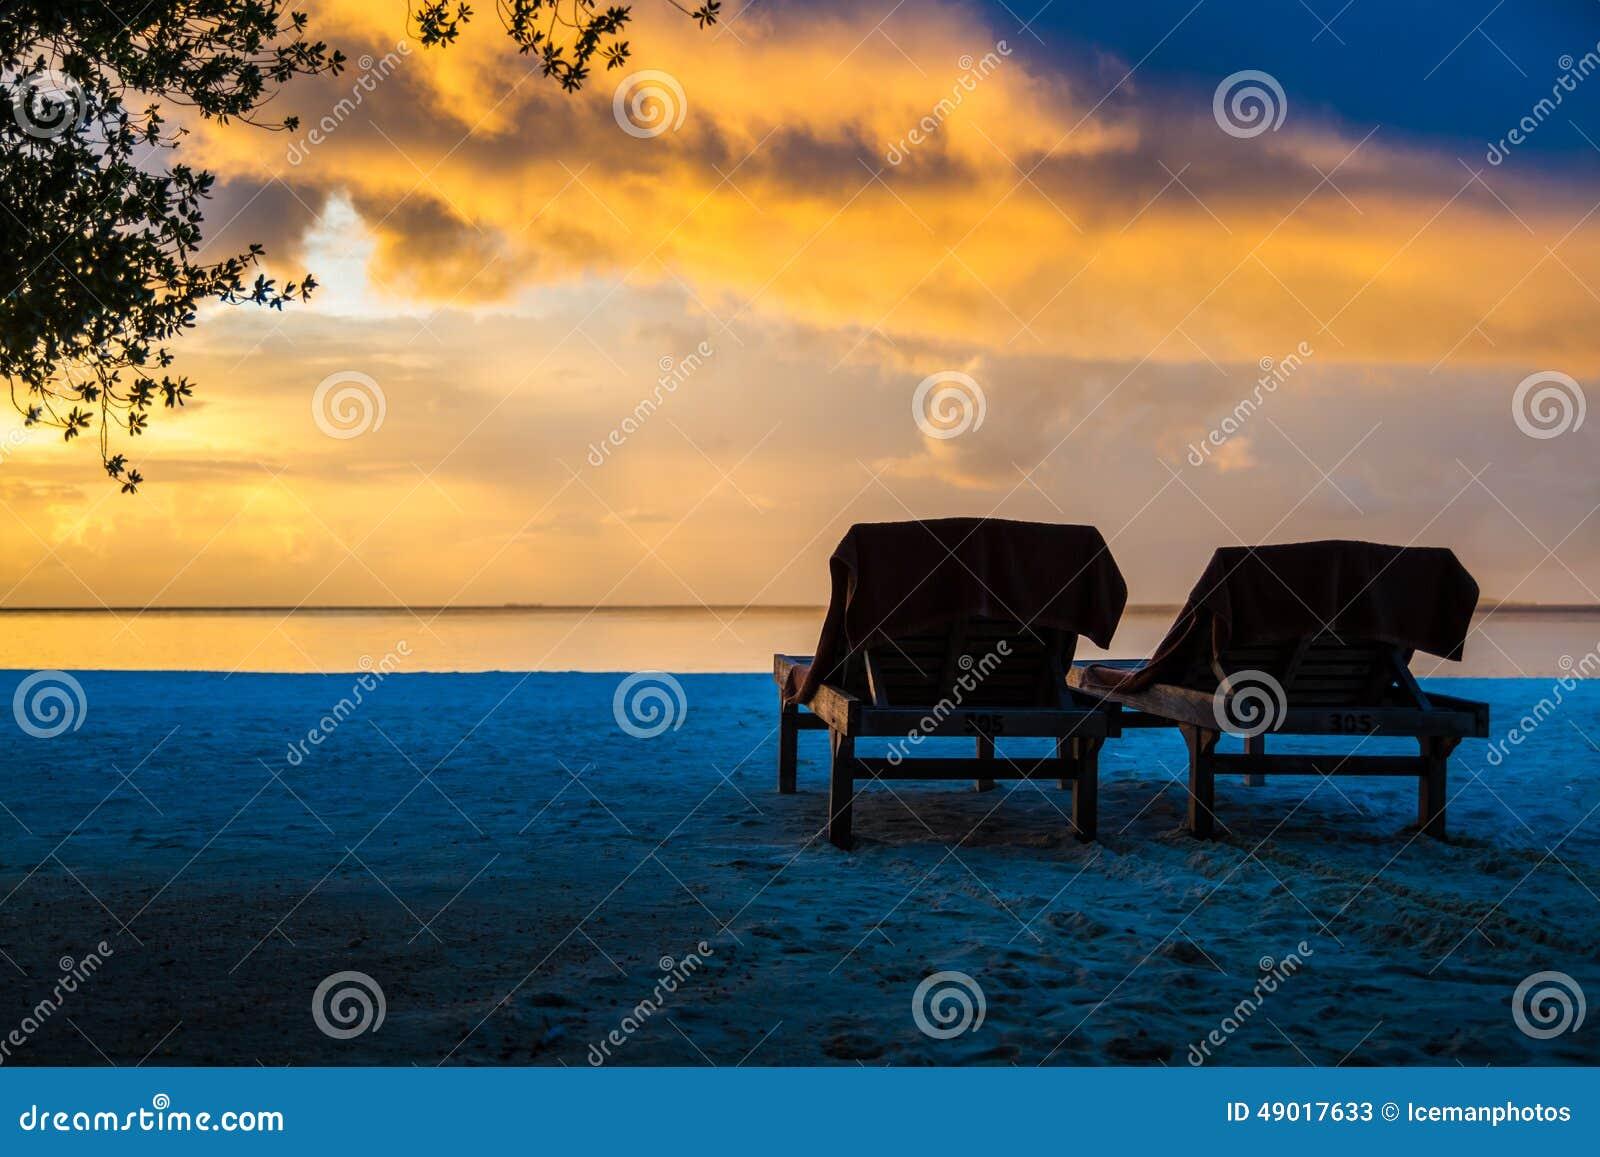 Sunset beach landscape with sunbeds, Maldives